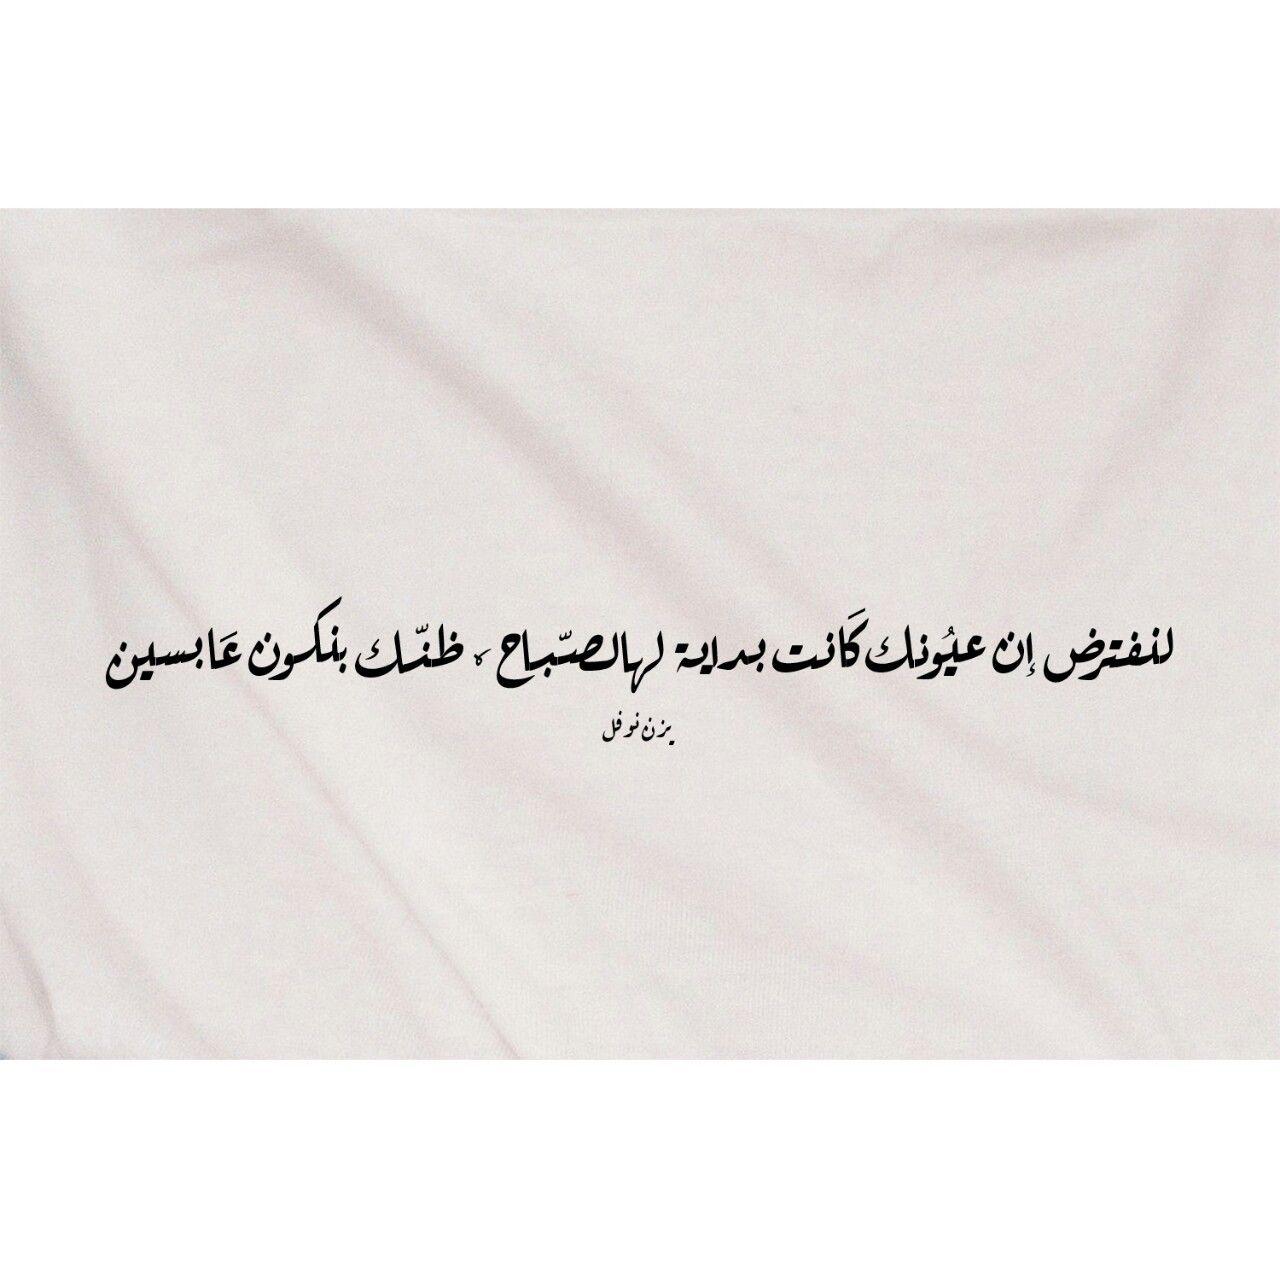 Yazannofal Morning Words Arabic Words Arabic Quotes